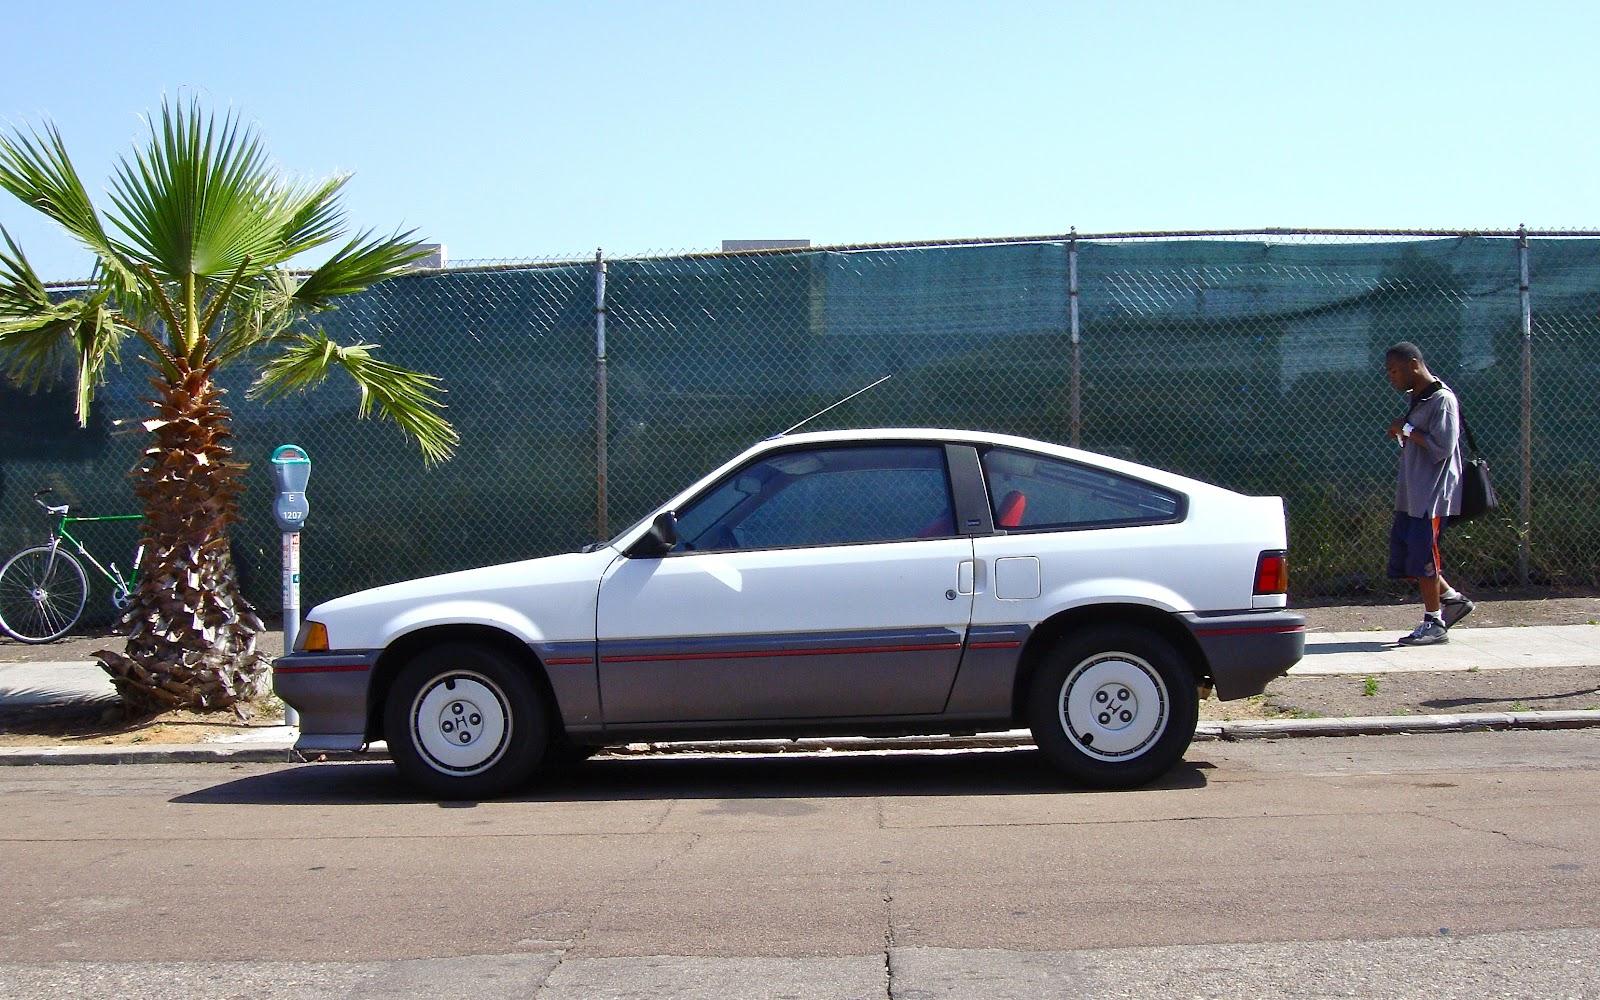 THE STREET PEEP: 1987 Honda Civic CR-X